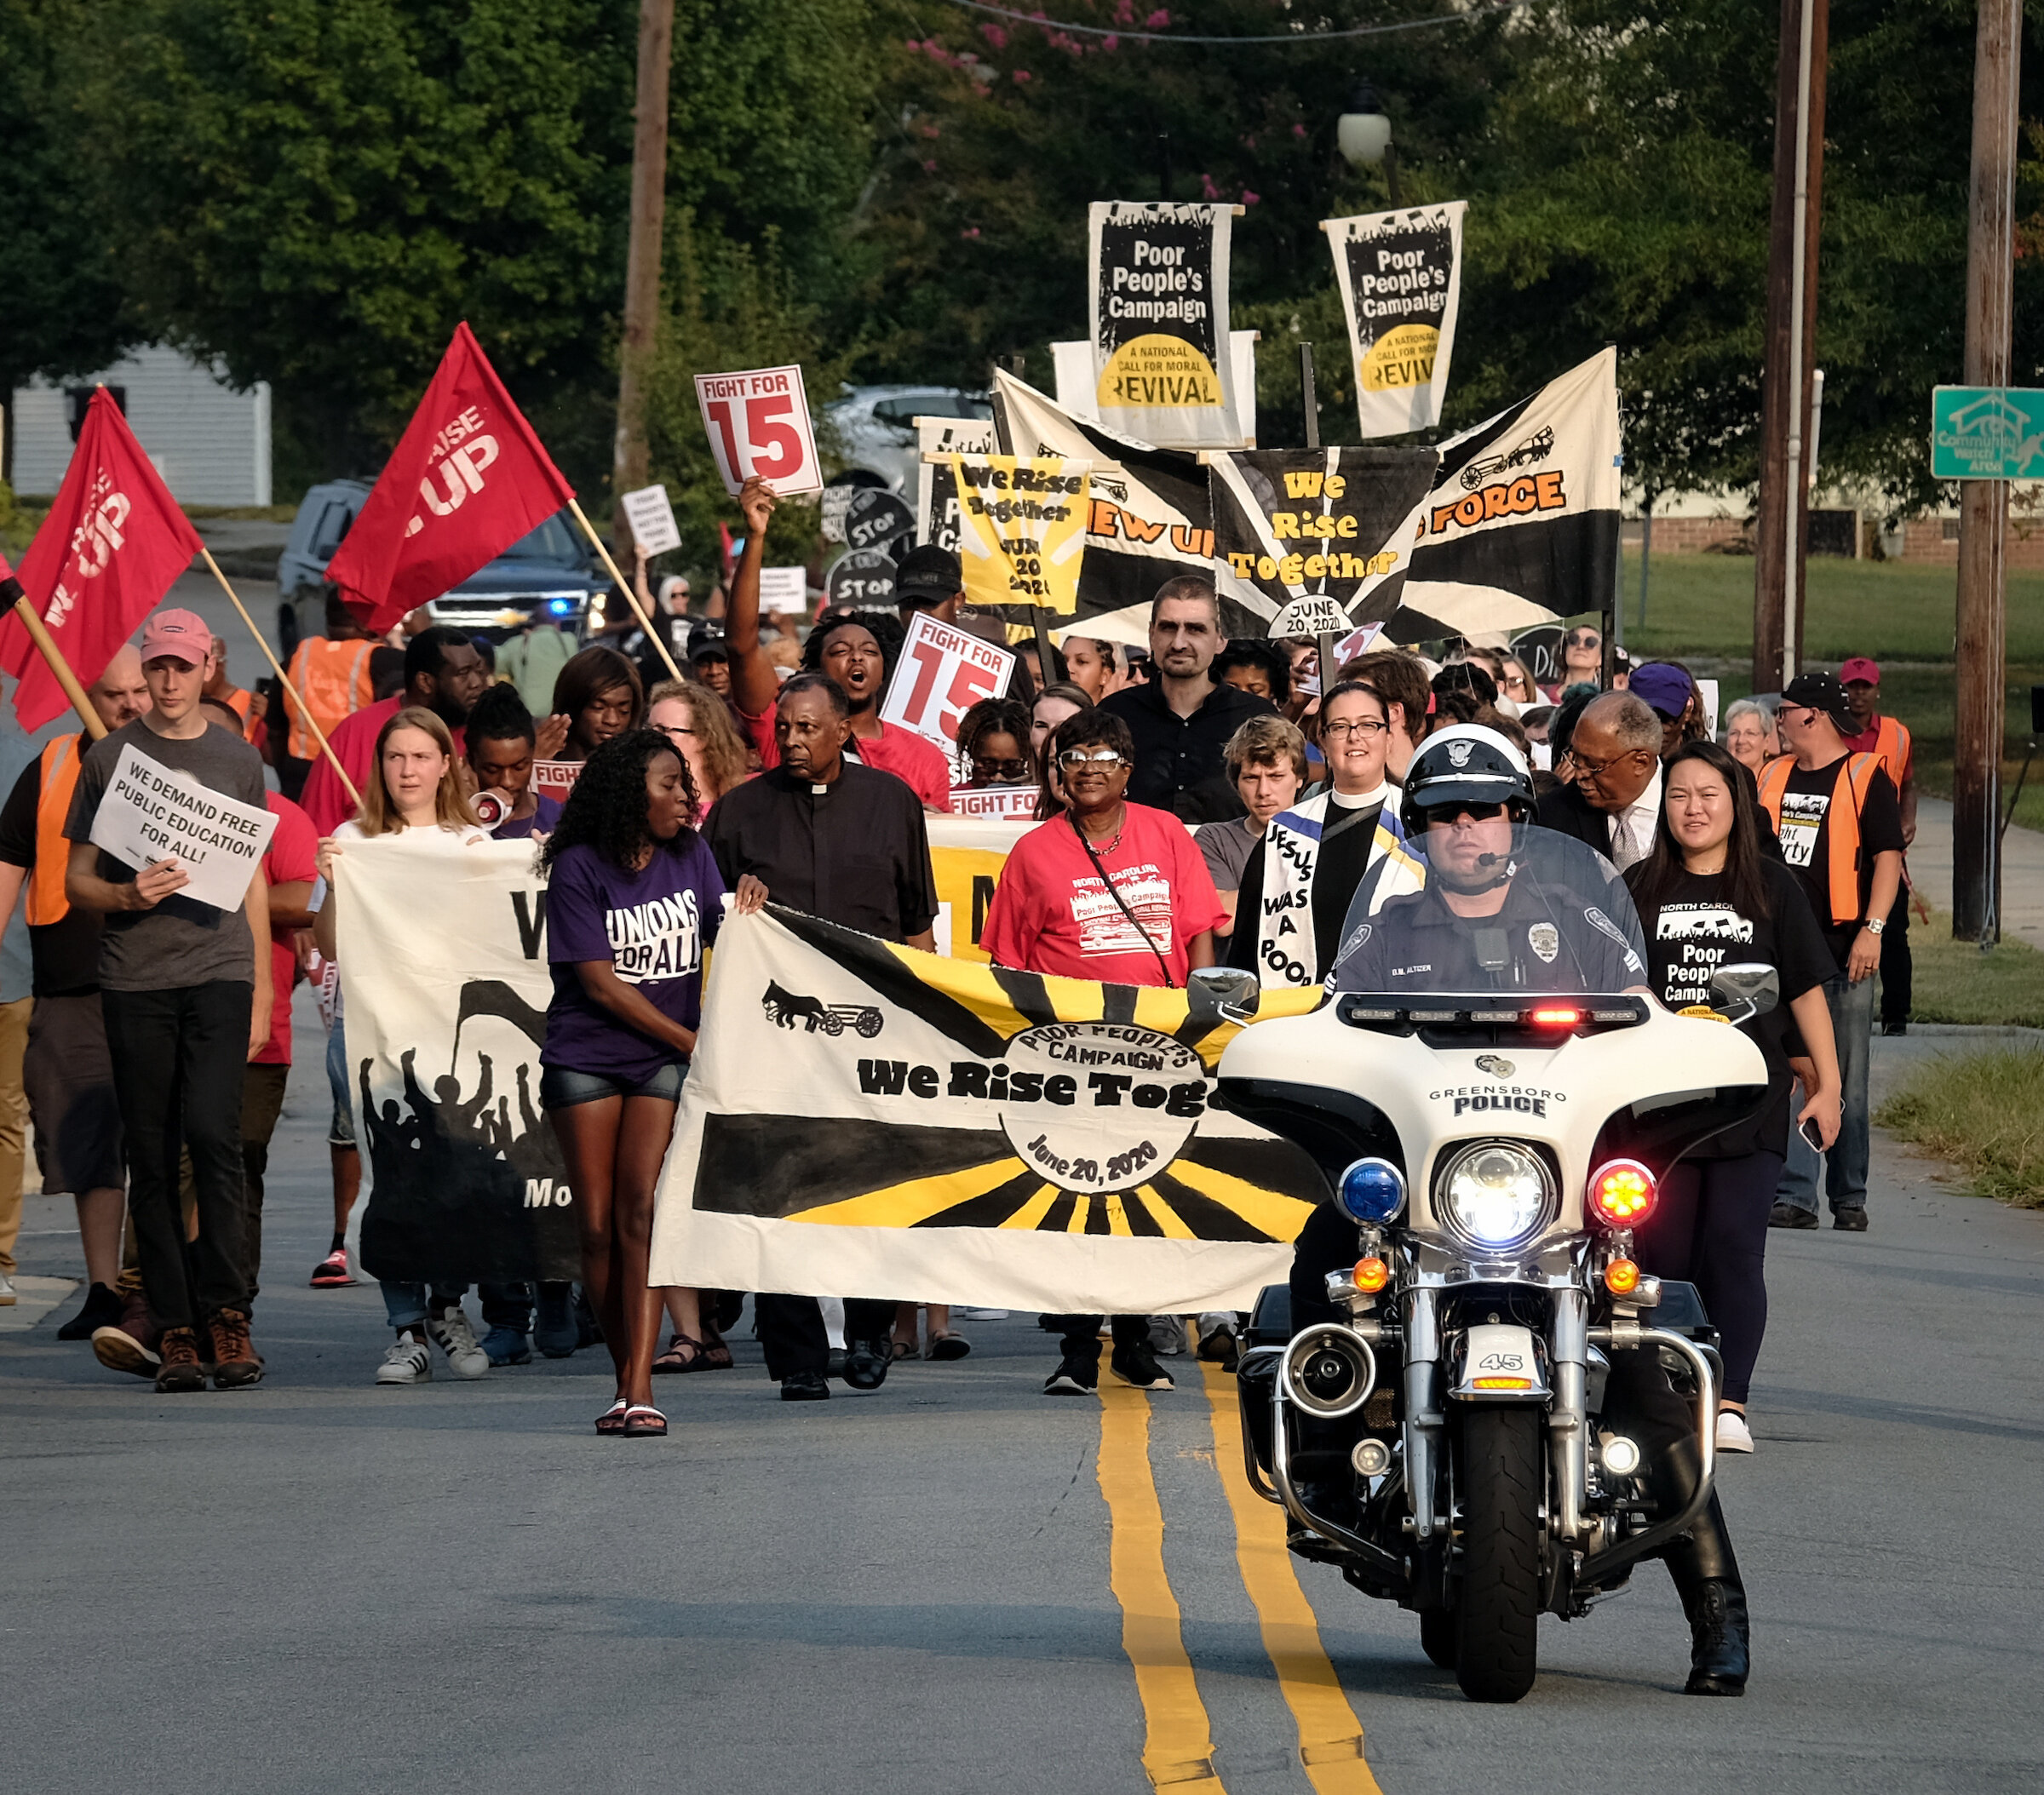 2019 0930 NC Greensboro MORE march by Steve Pavey HopeinFocus-69.jpg